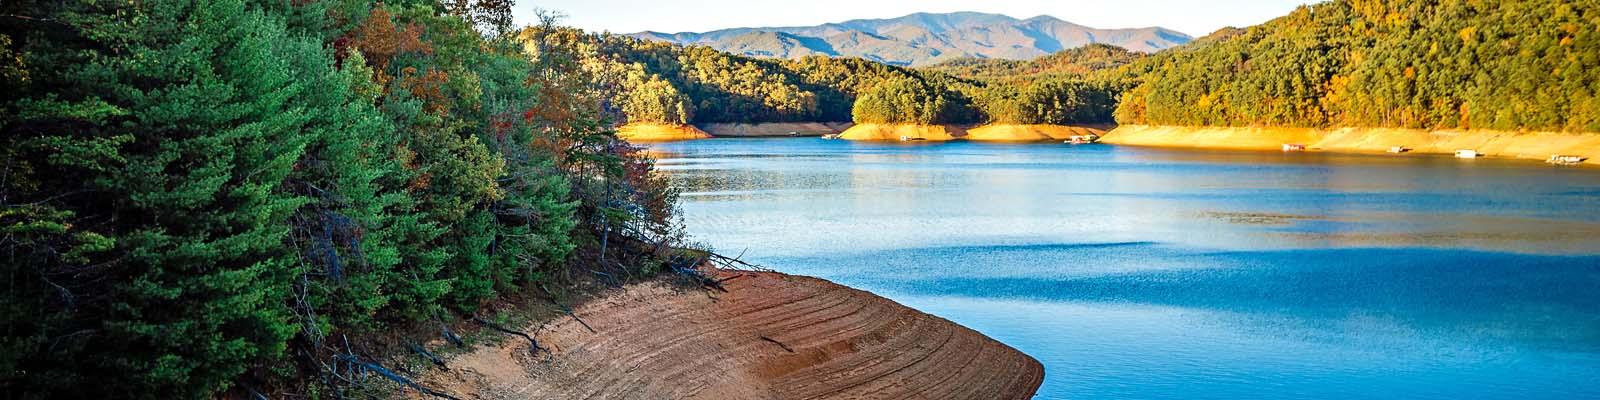 Pictured: A lake in North Carolina.